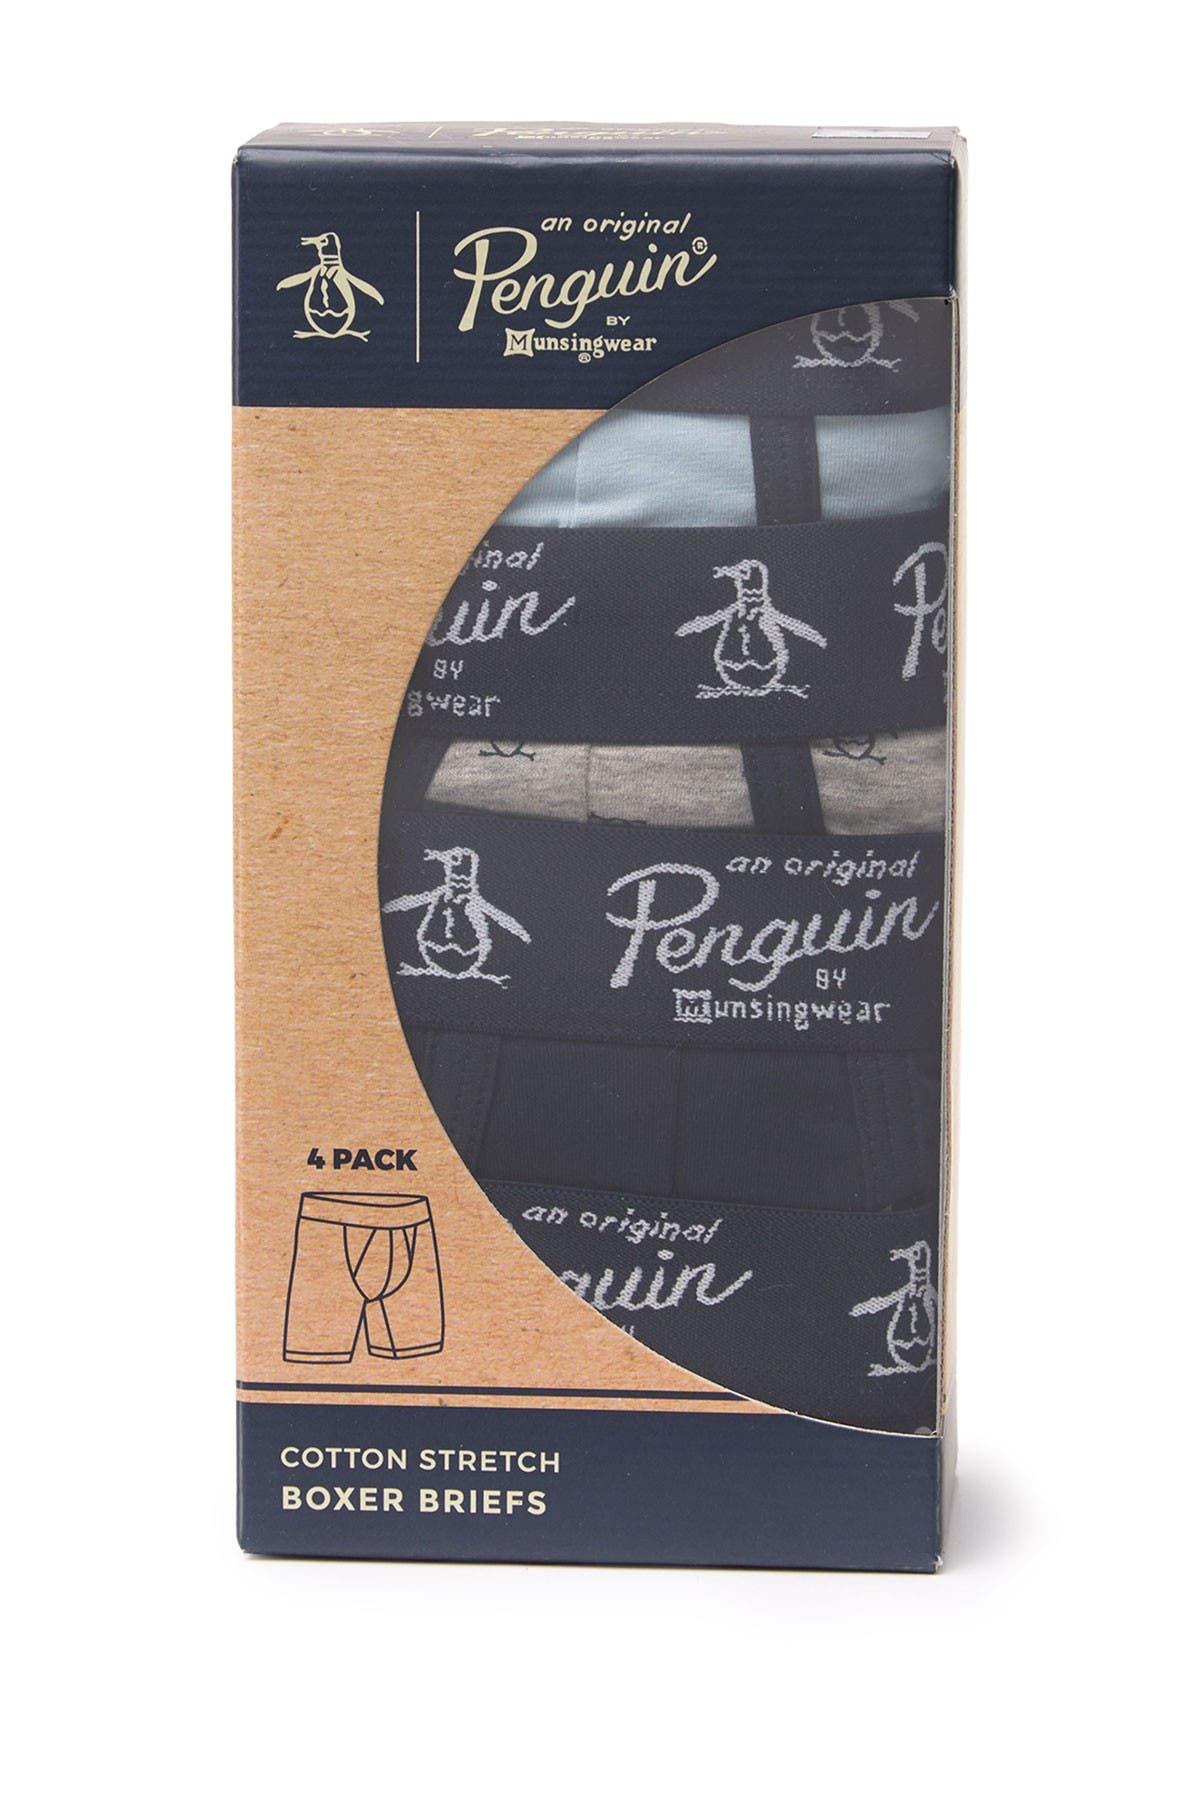 Image of Original Penguin Cotton Stretch Boxer Briefs - Pack of 4